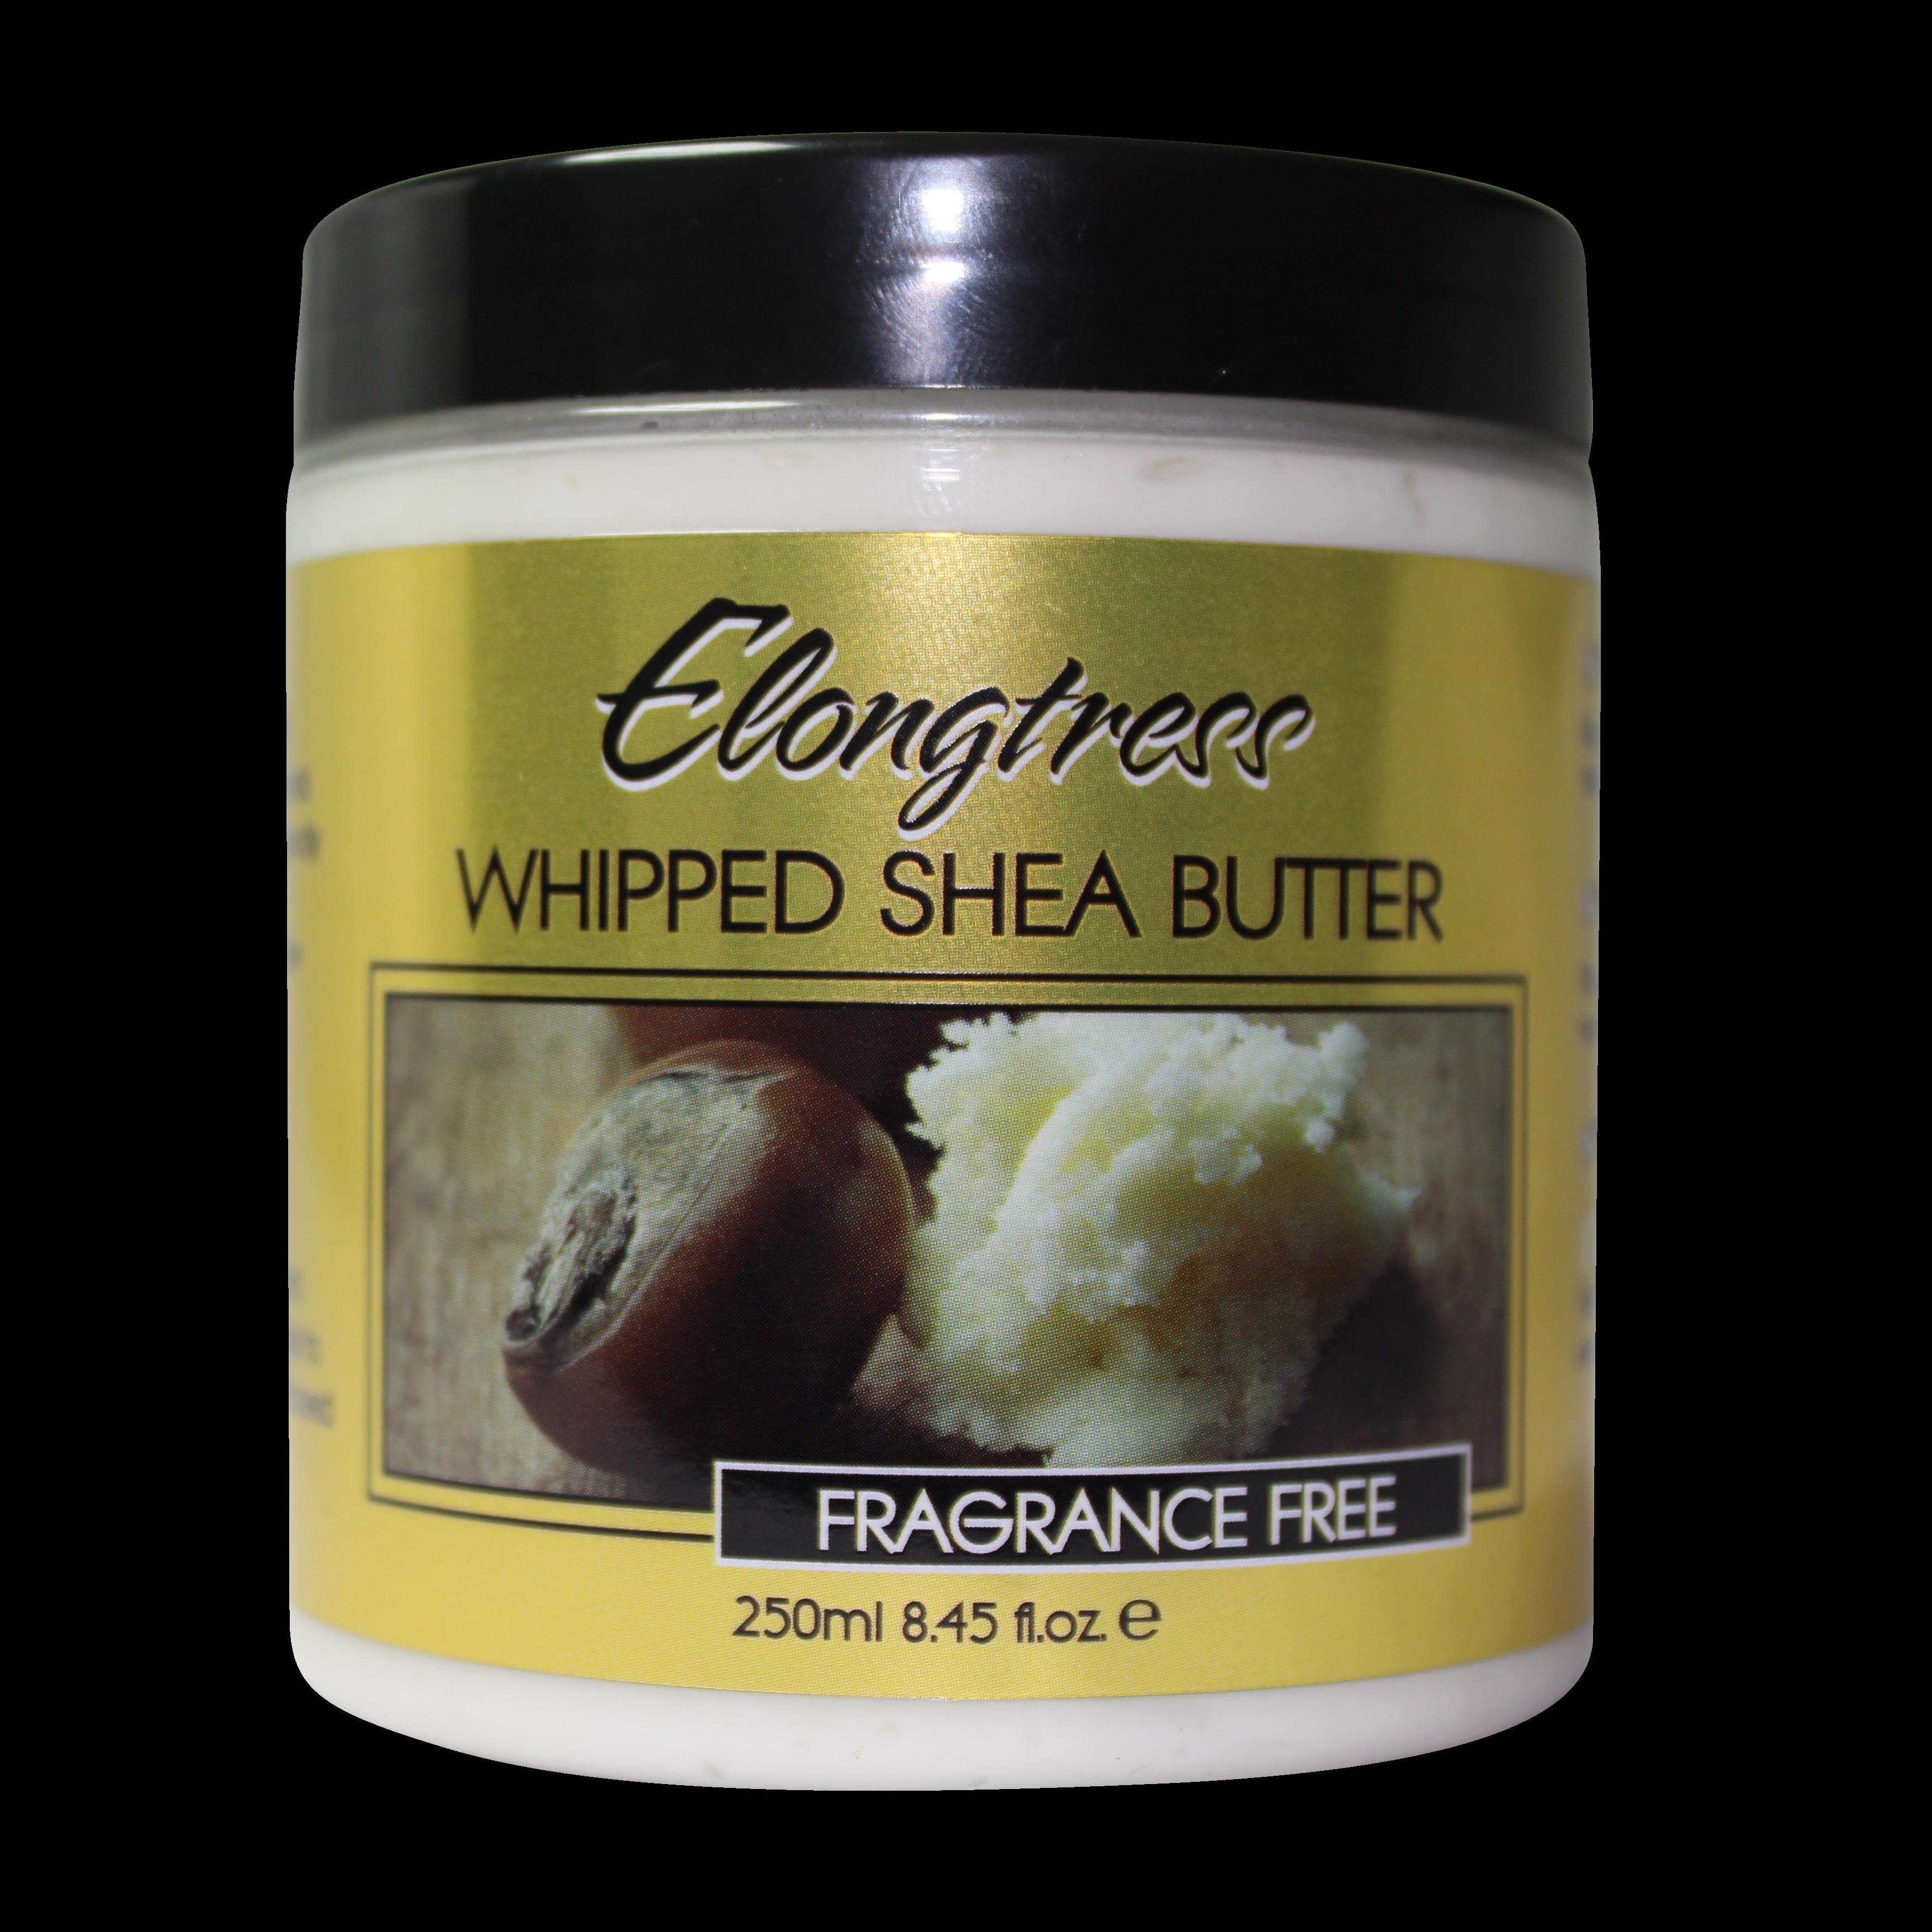 Undo straight perm - Elongtress Whipped Shea Butter Fragrance Free